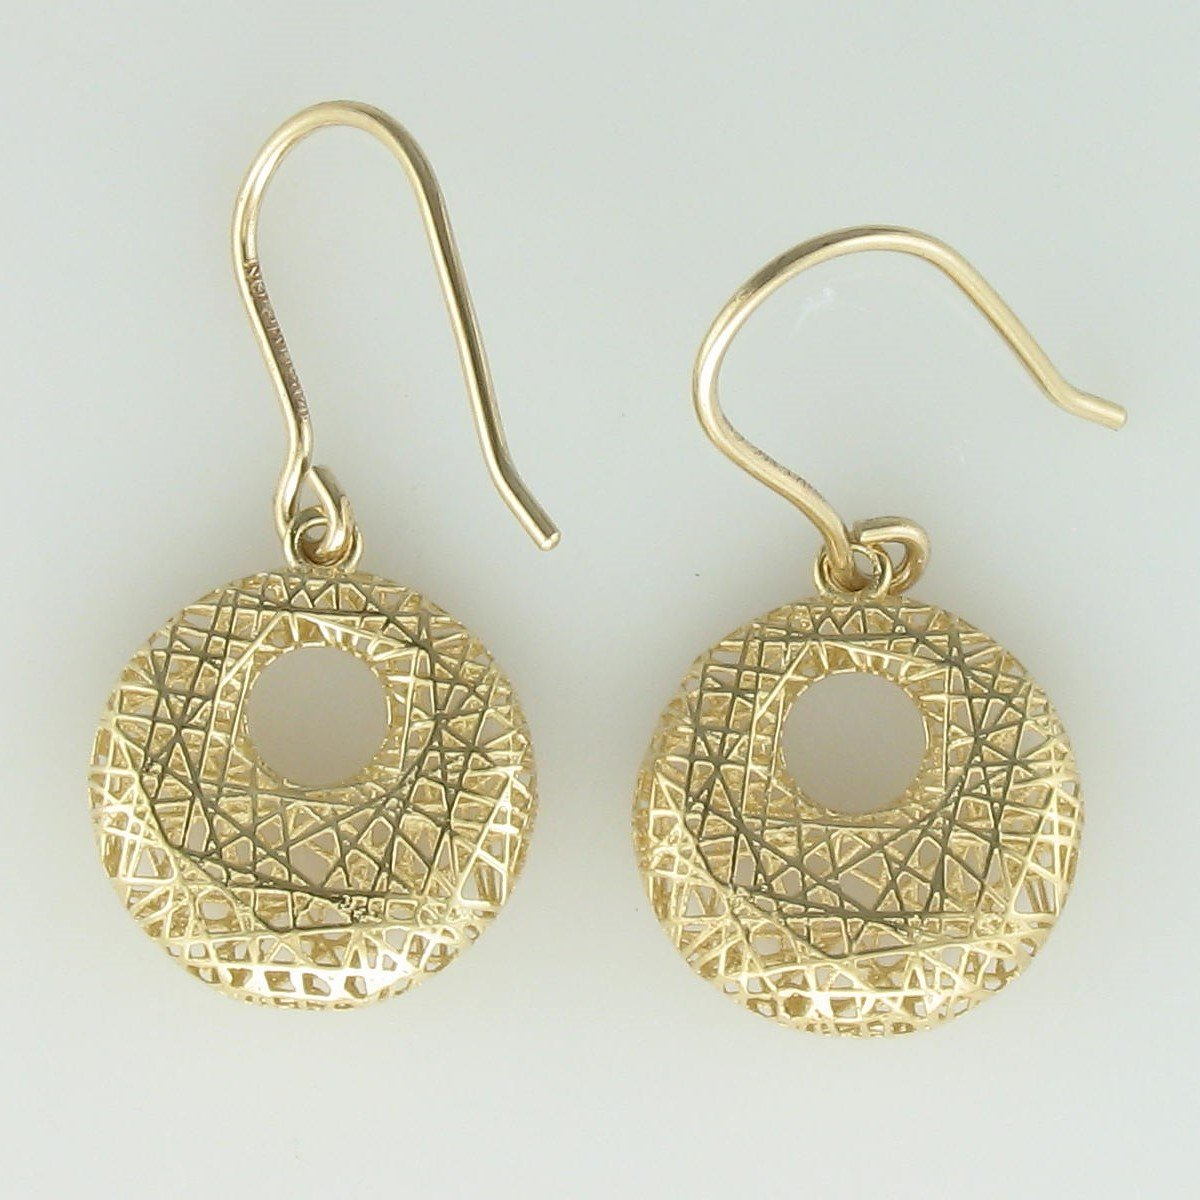 3-D Open Circle Dangle Earrings in 14 Karat Yellow Gold